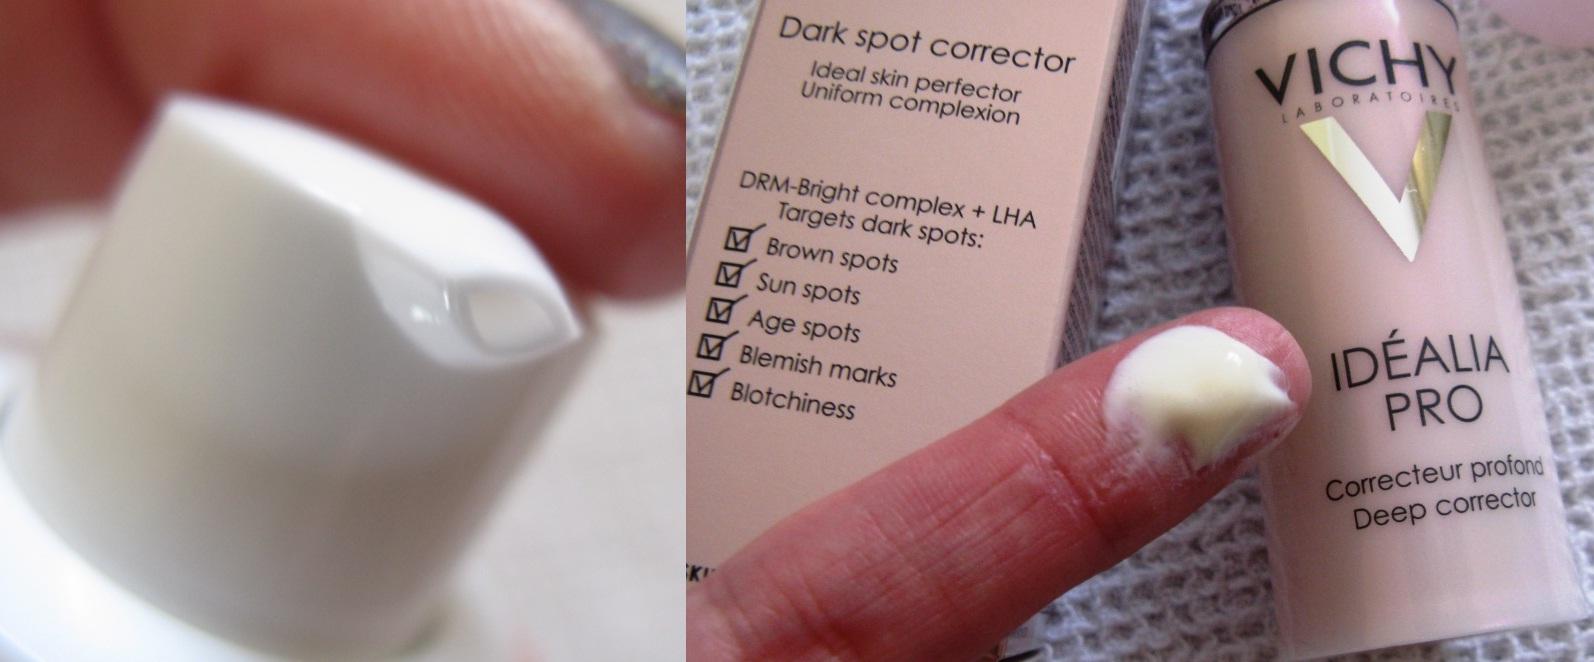 Girlwiththeskew-Earring: Vichy Idealia Pro Dark Spot Corrector